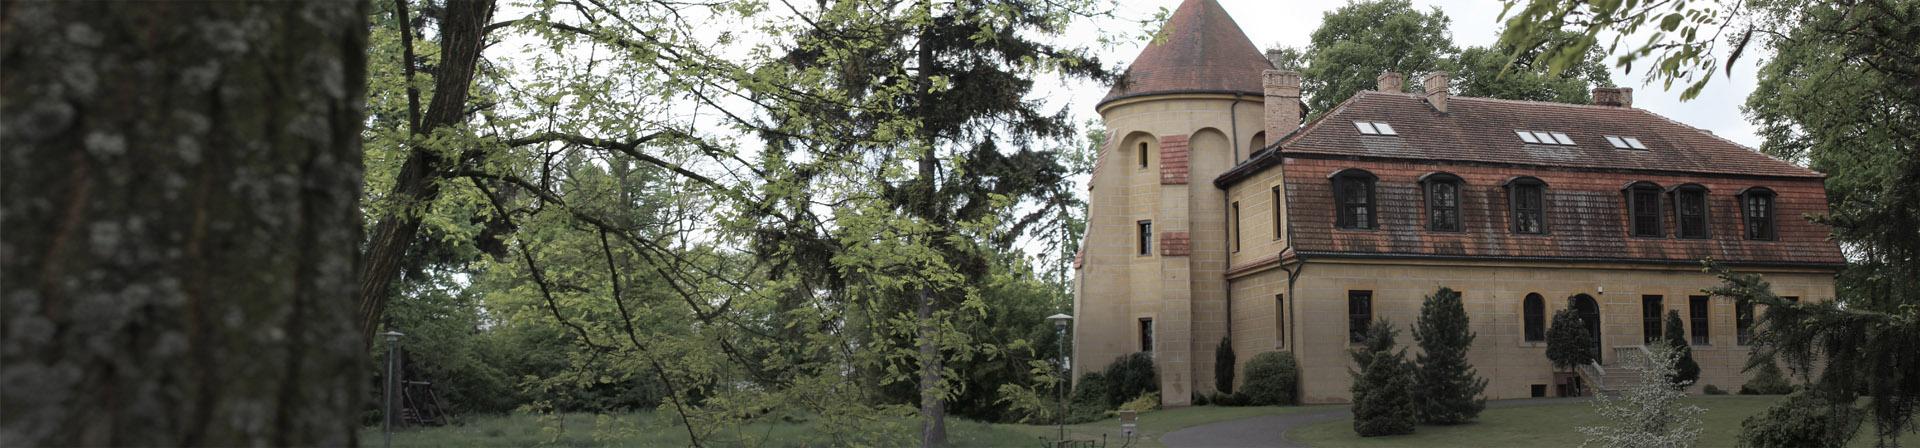 Zamek w Dobrej